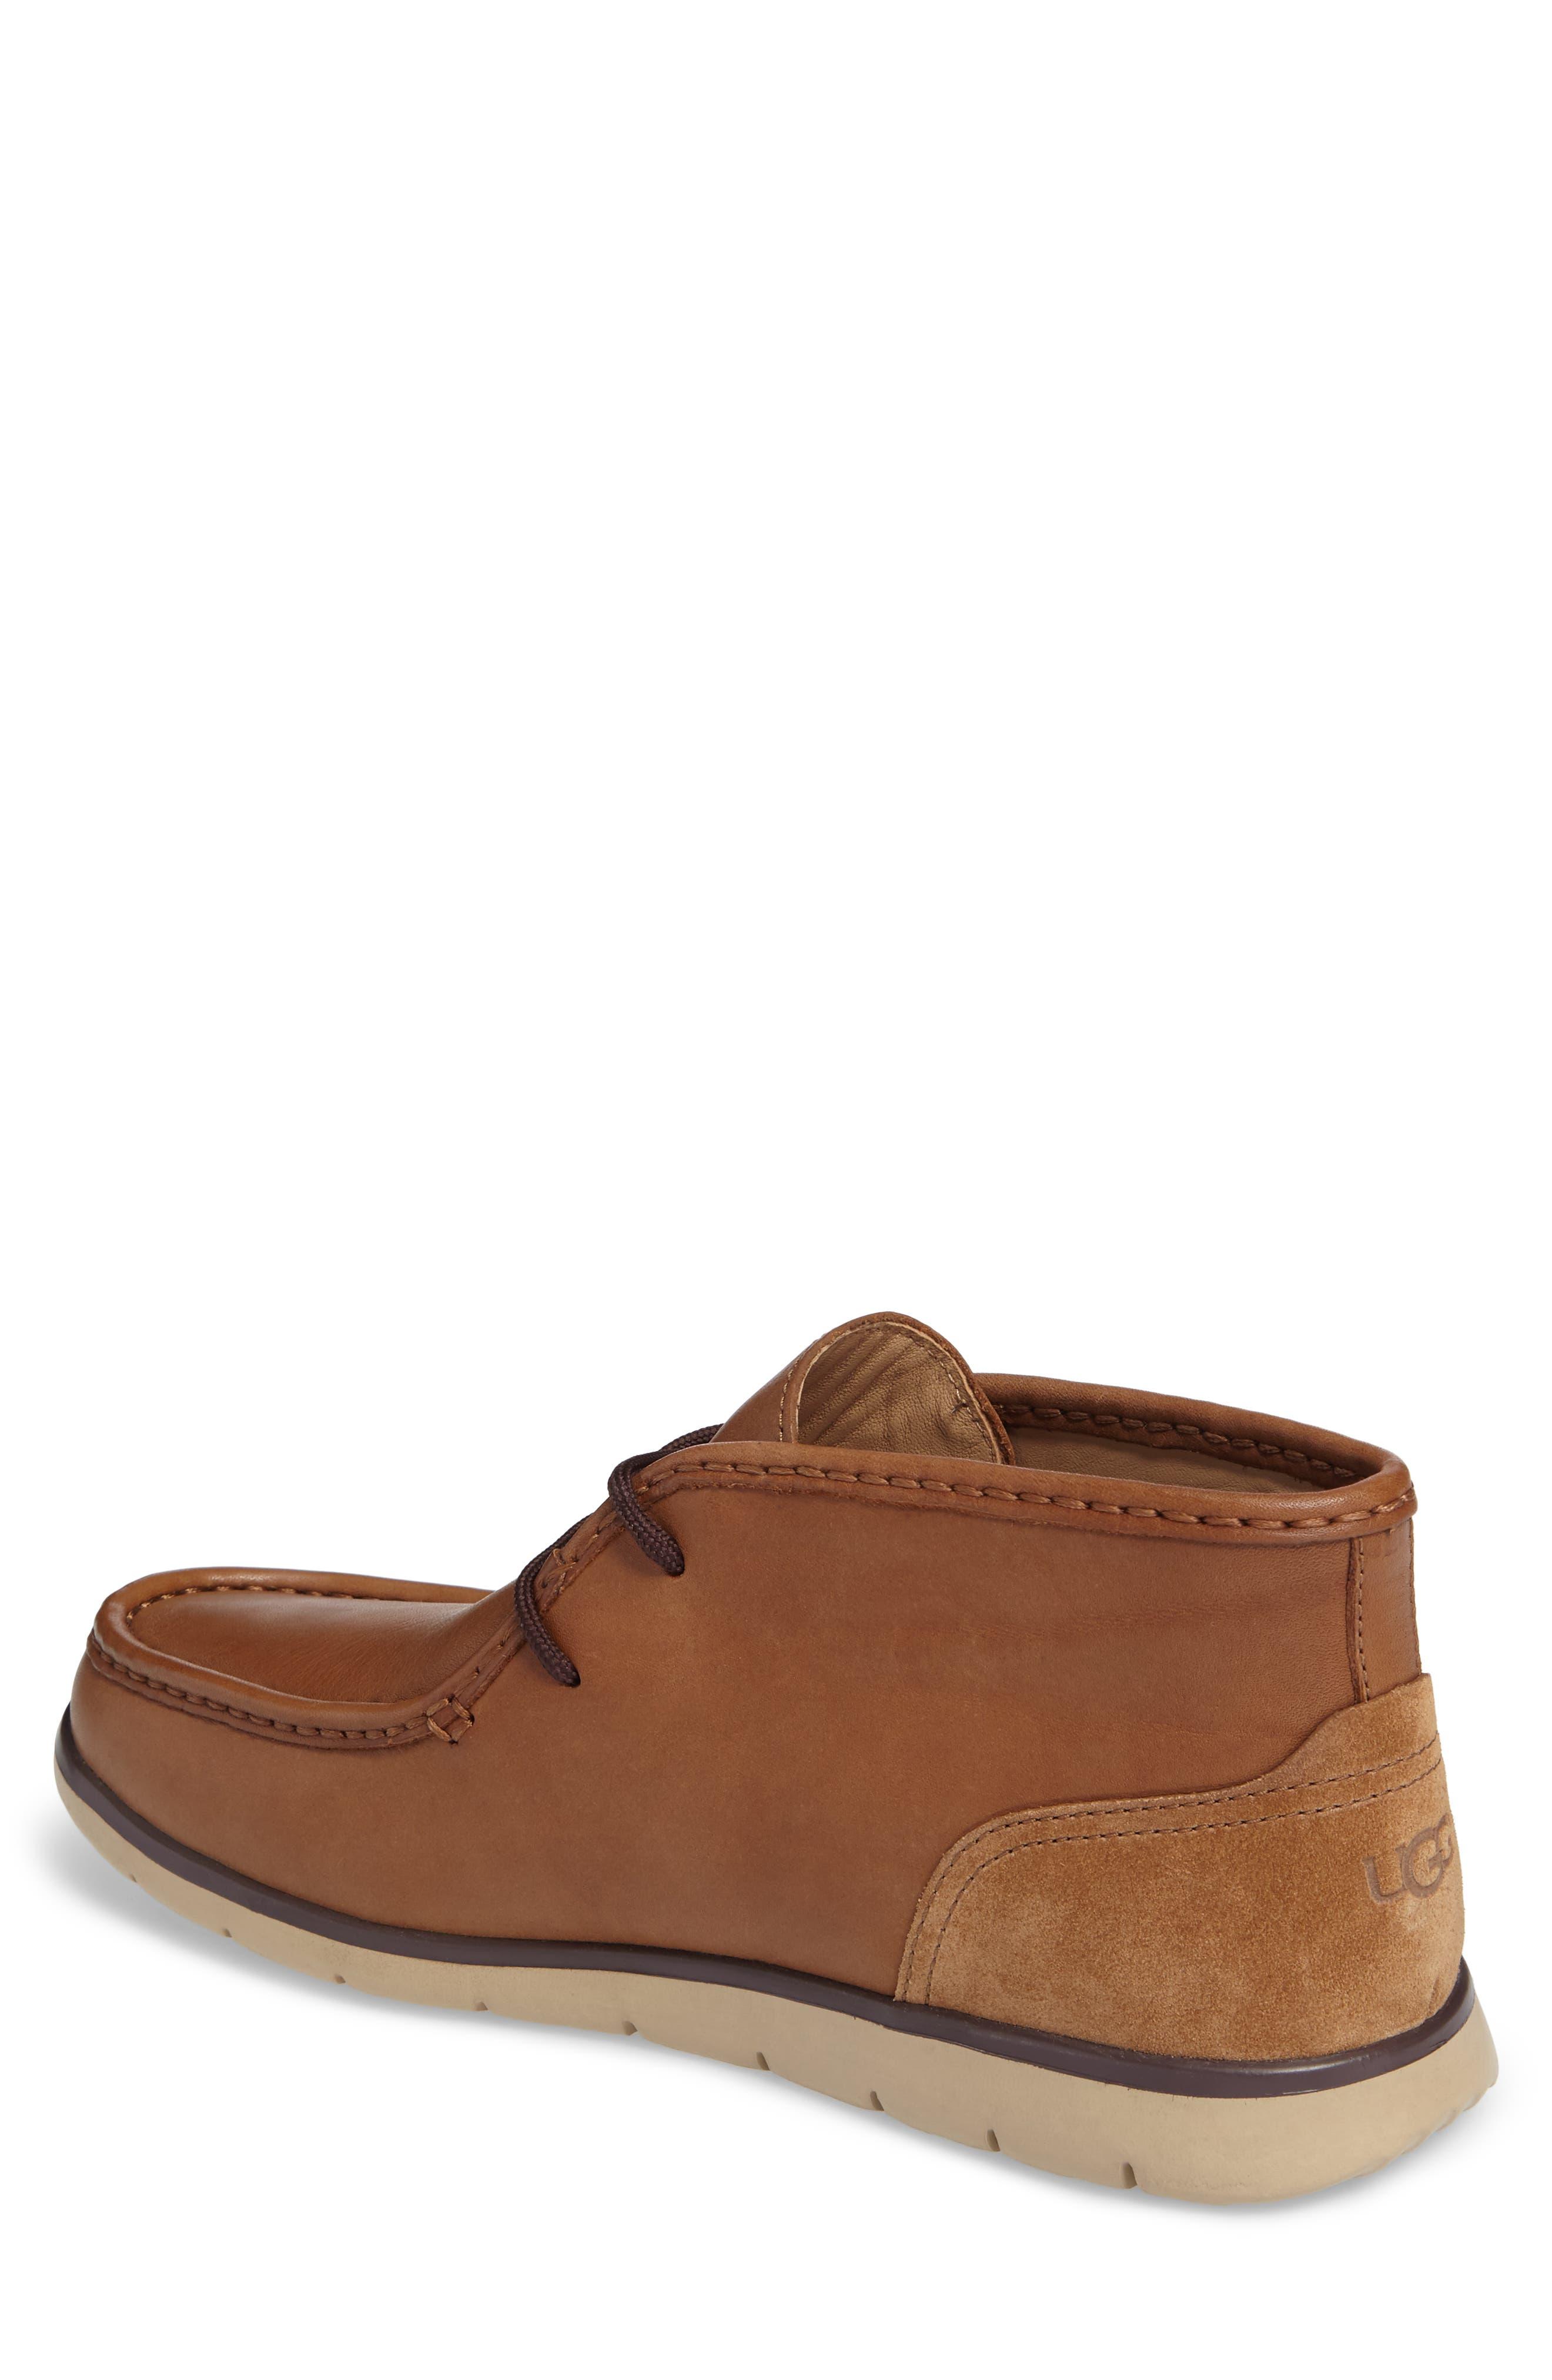 Alternate Image 2  - UGG® 'Hendrickson' Chukka Boot (Men)